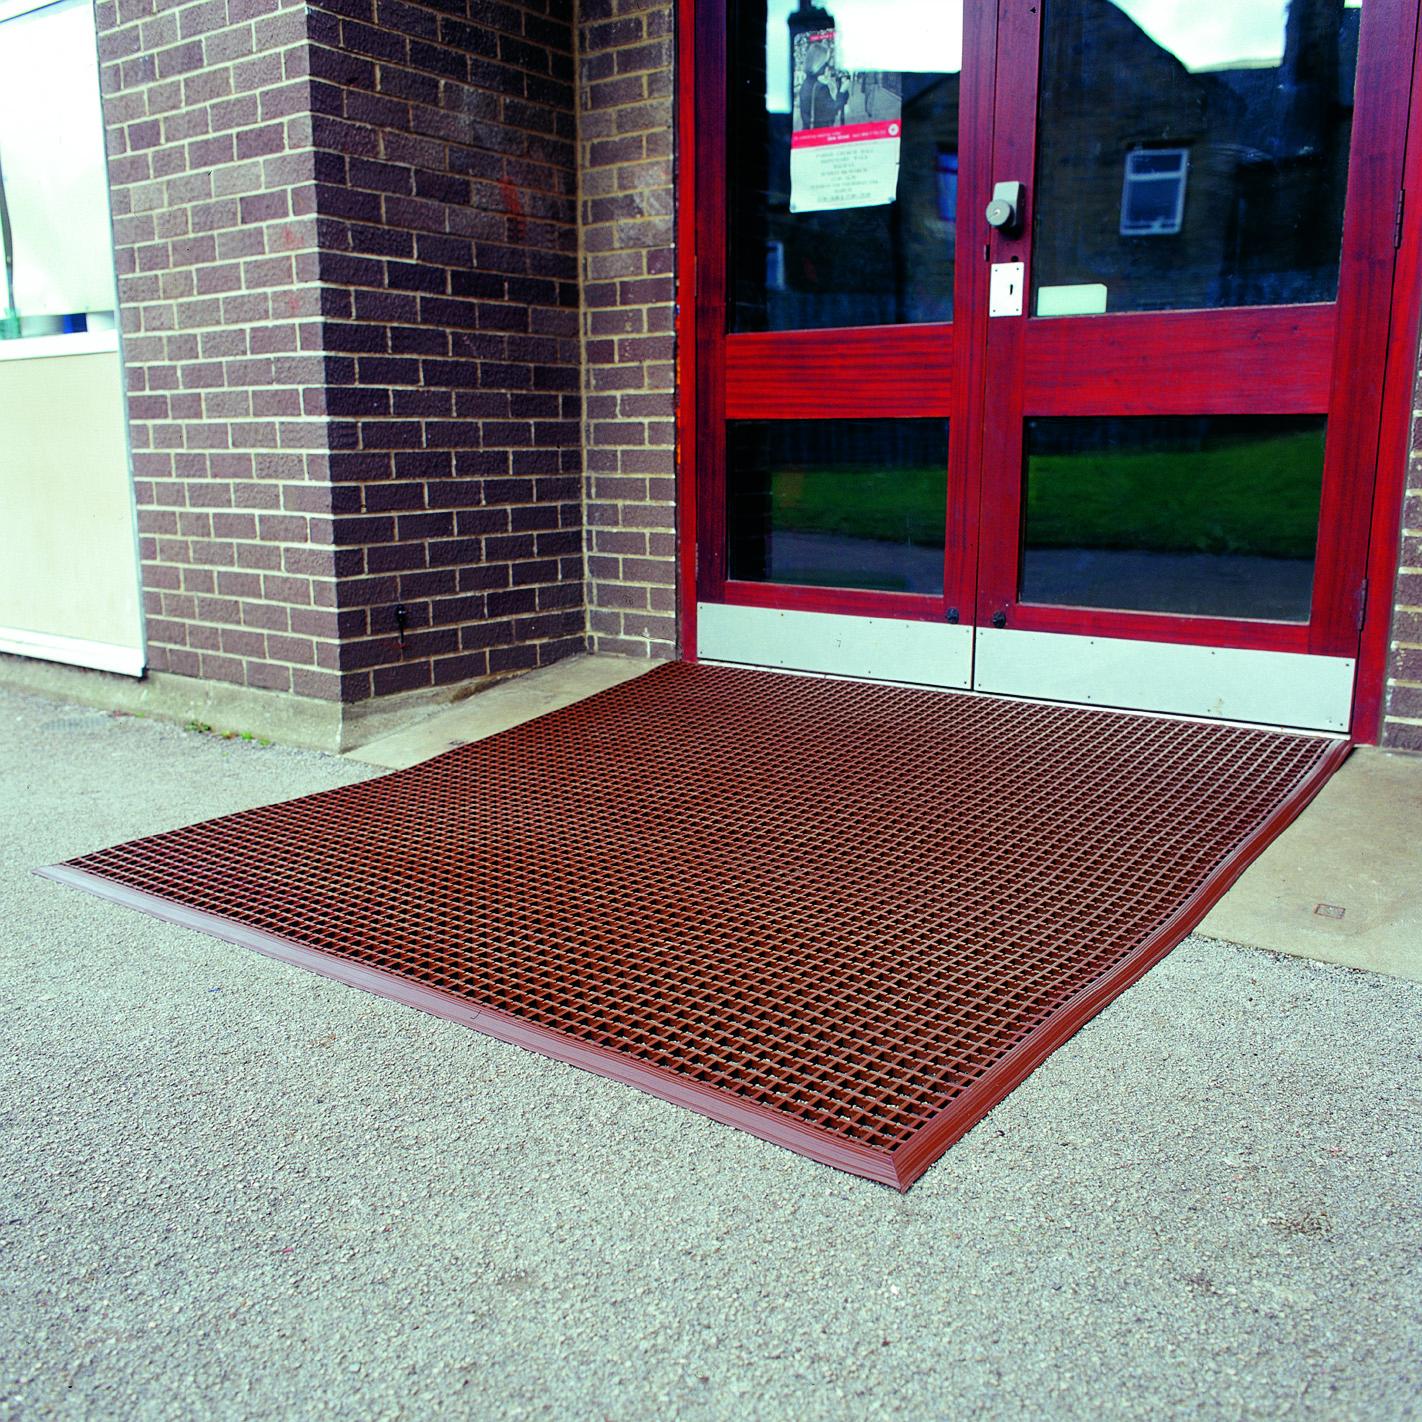 frm open matting burgess clip picture mat together shop top mats